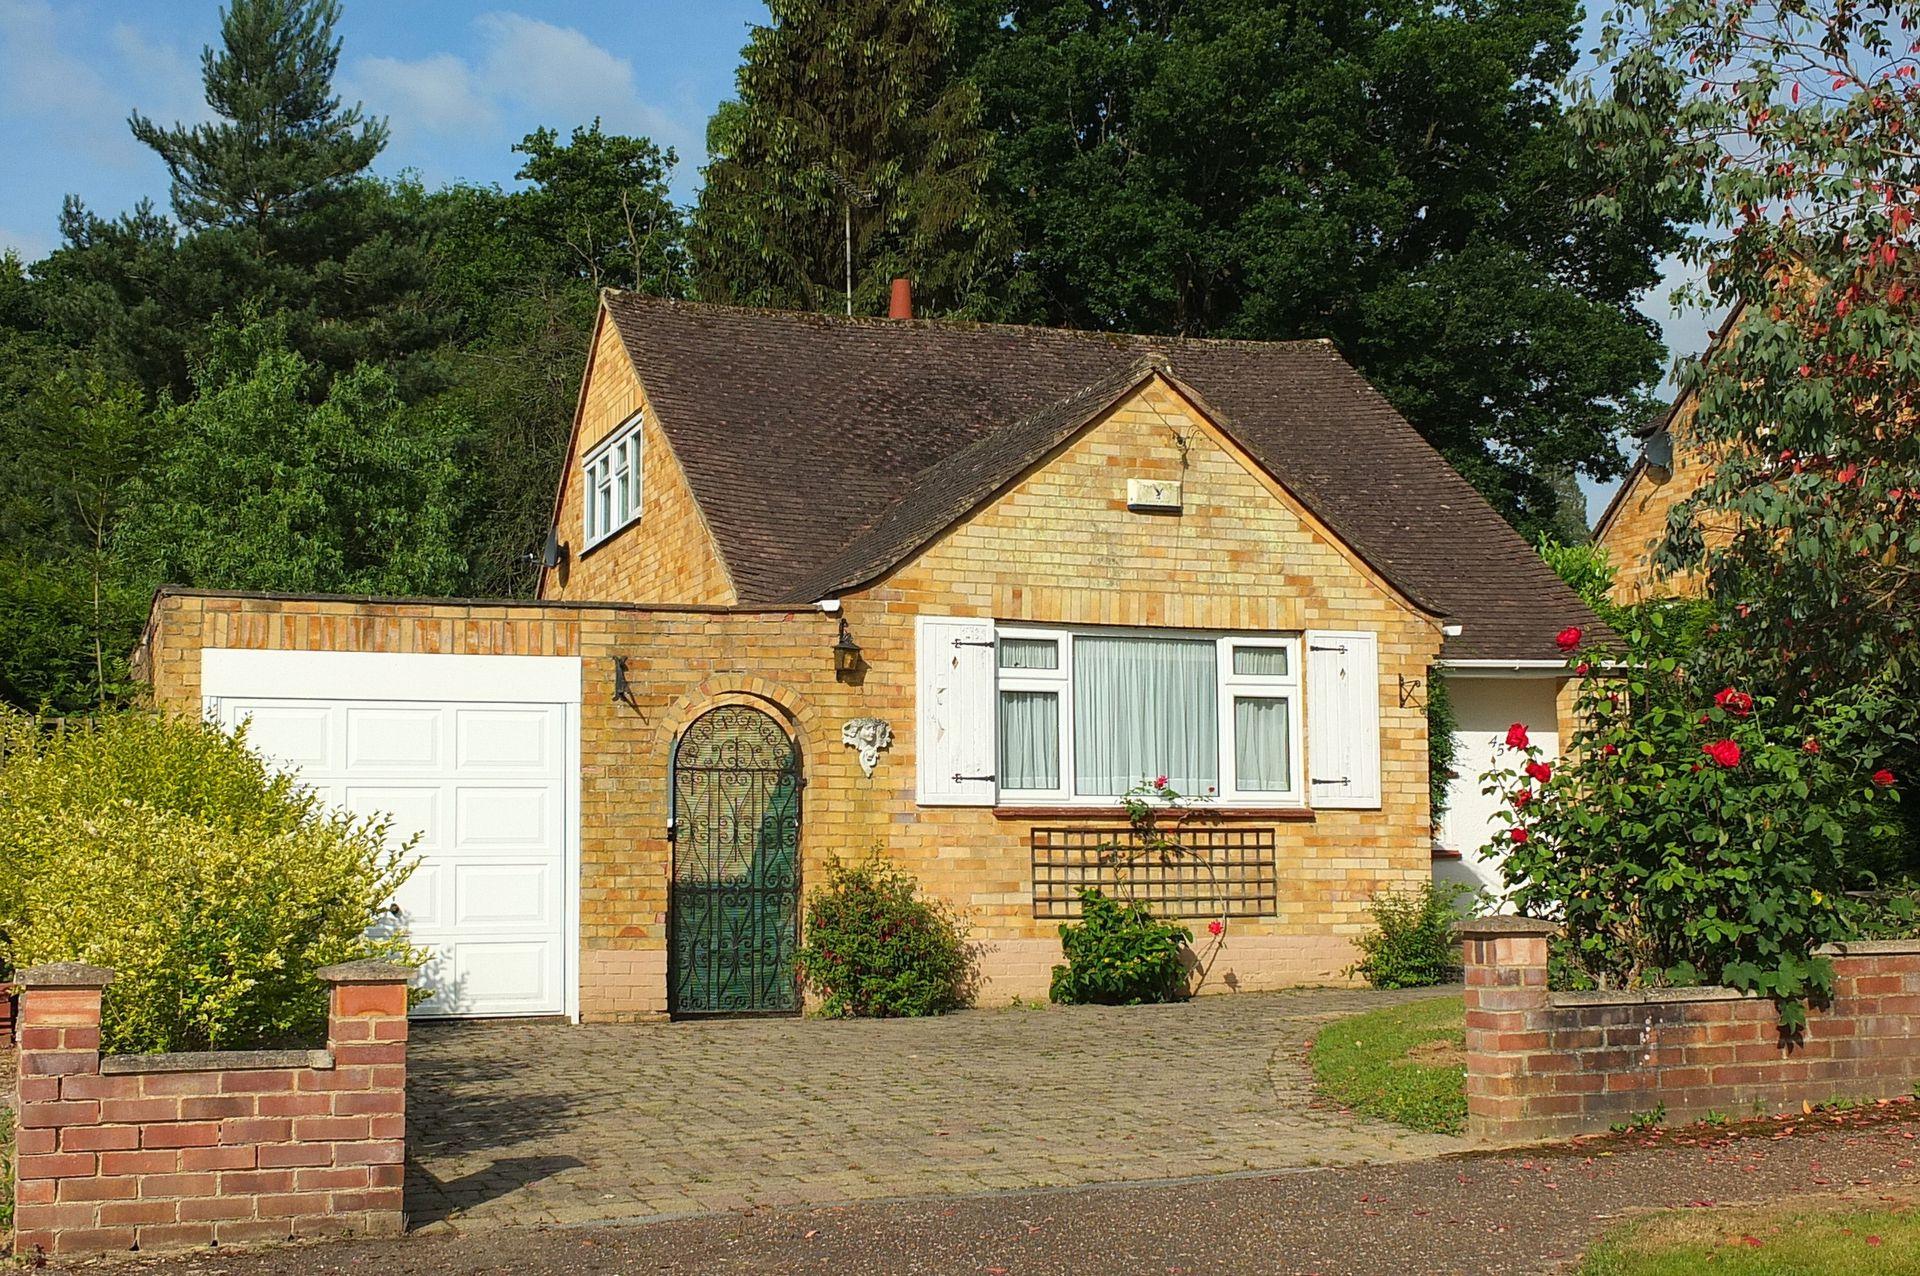 Photo 4, Farlington Avenue, Haywards Heath, RH16